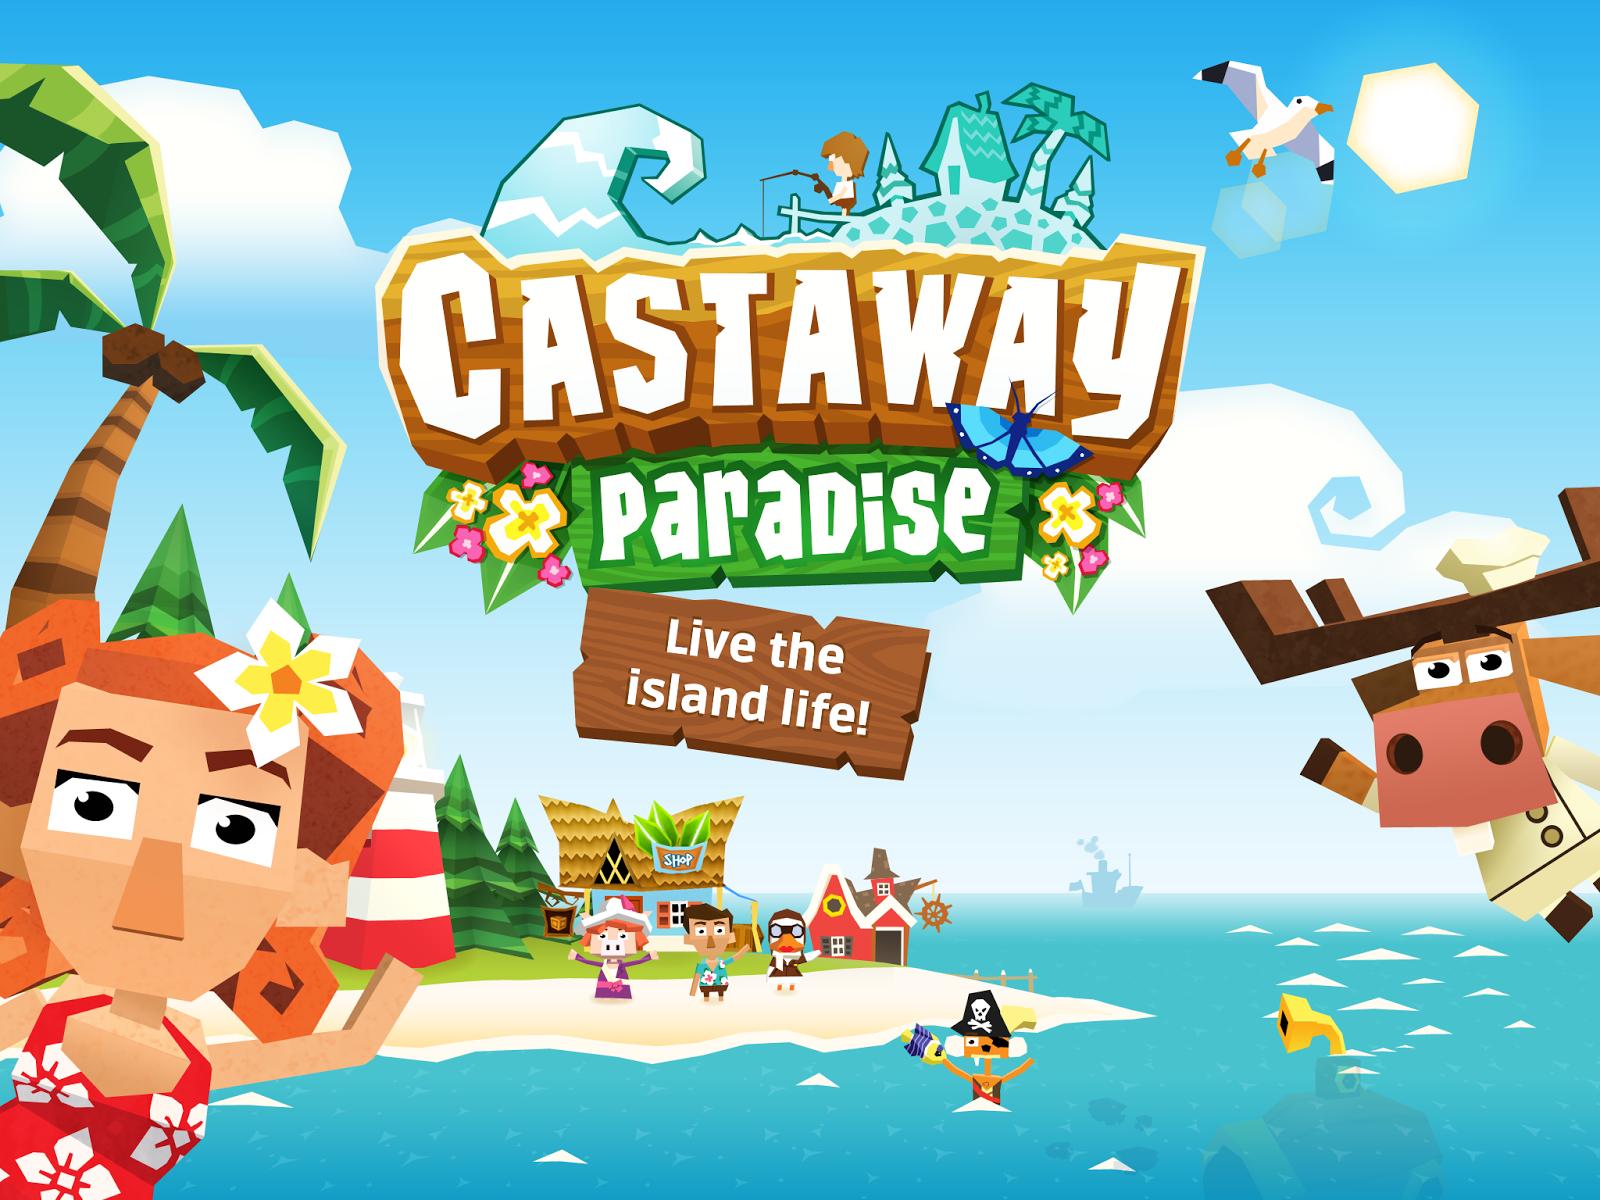 castaway paradise Like animals, Animal crossing, Game